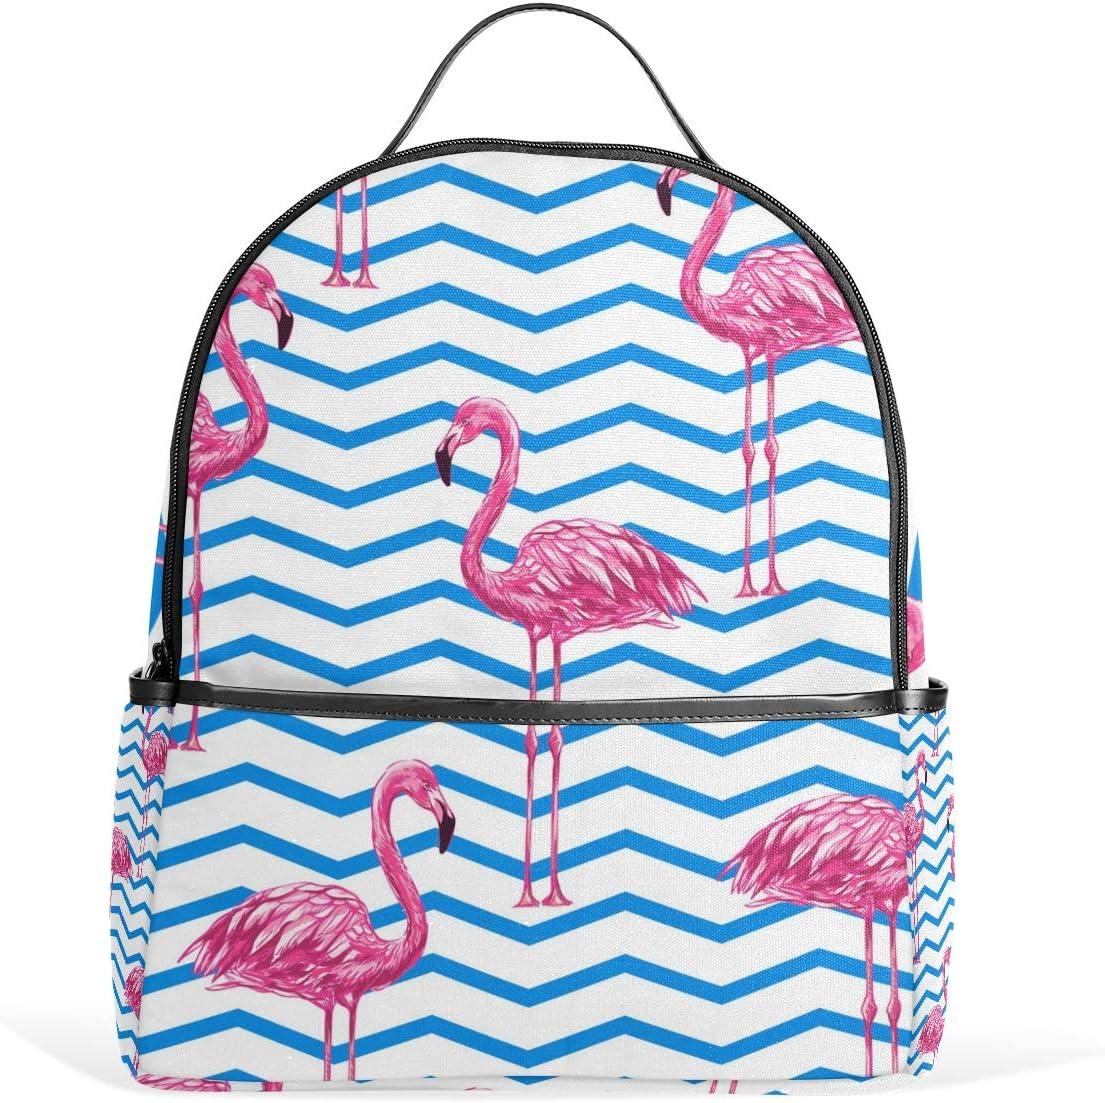 Backpack Rucksack Travel Daypack Colorful Circle Book Bag Casual Travel Waterproof